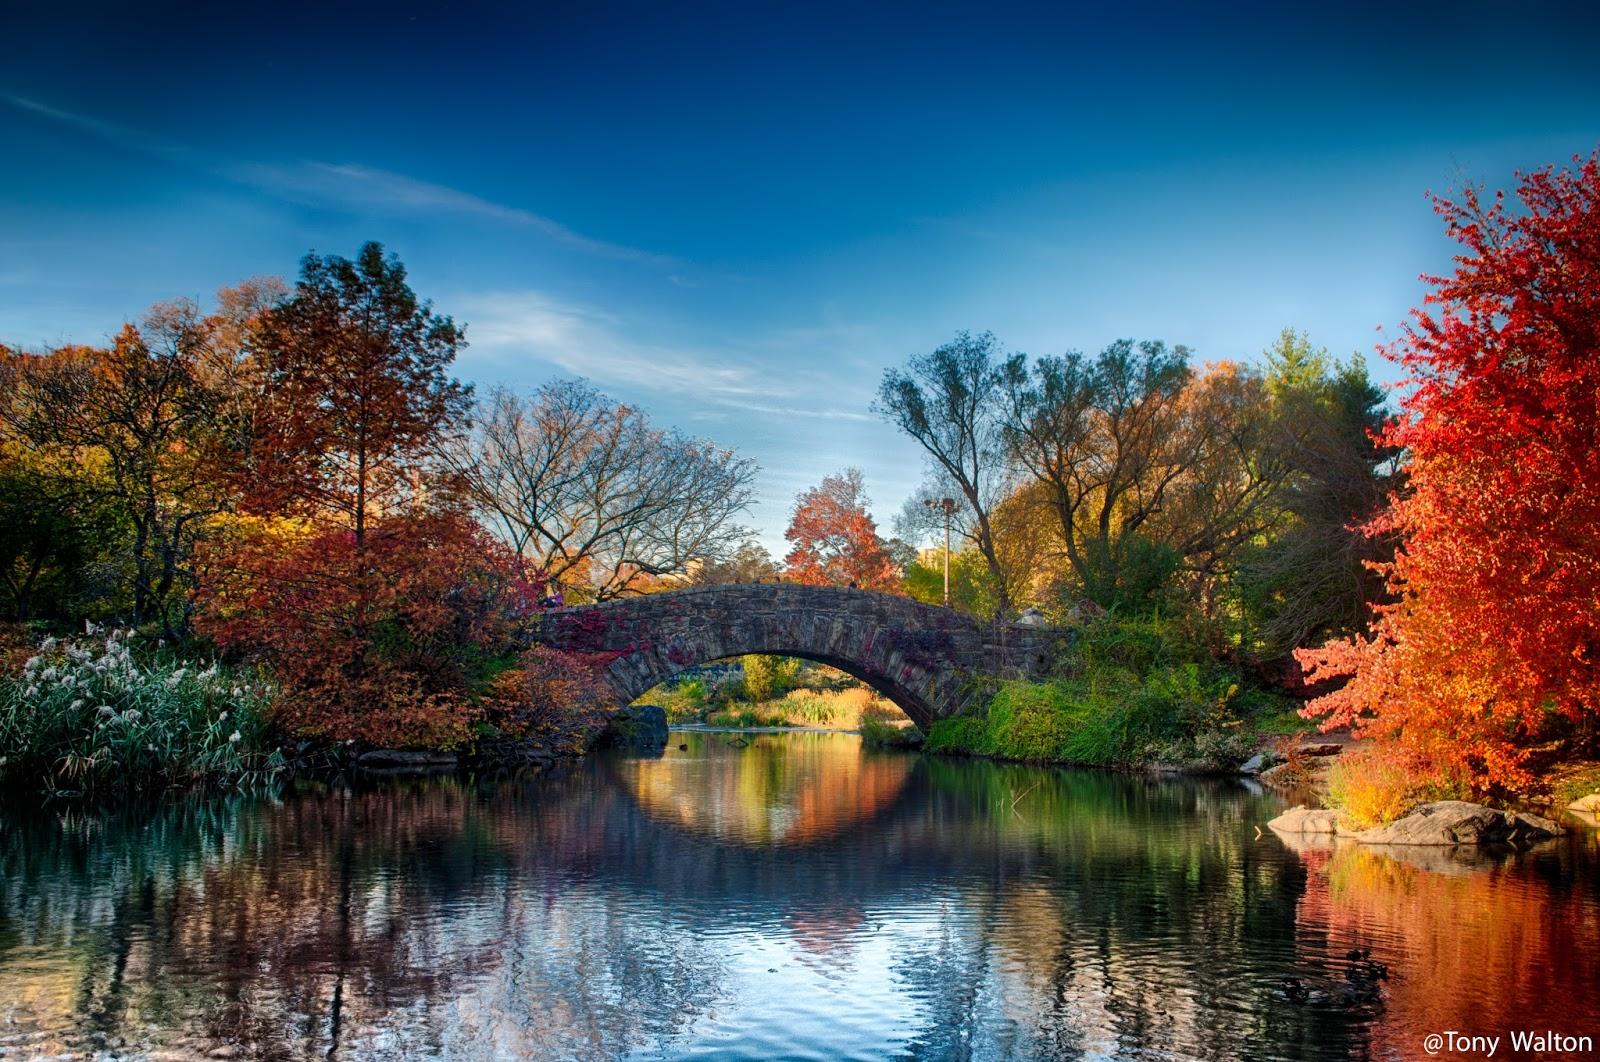 Fall Wallpaper For Windows Tony Walton New York City Gapstow Bridge Central Park